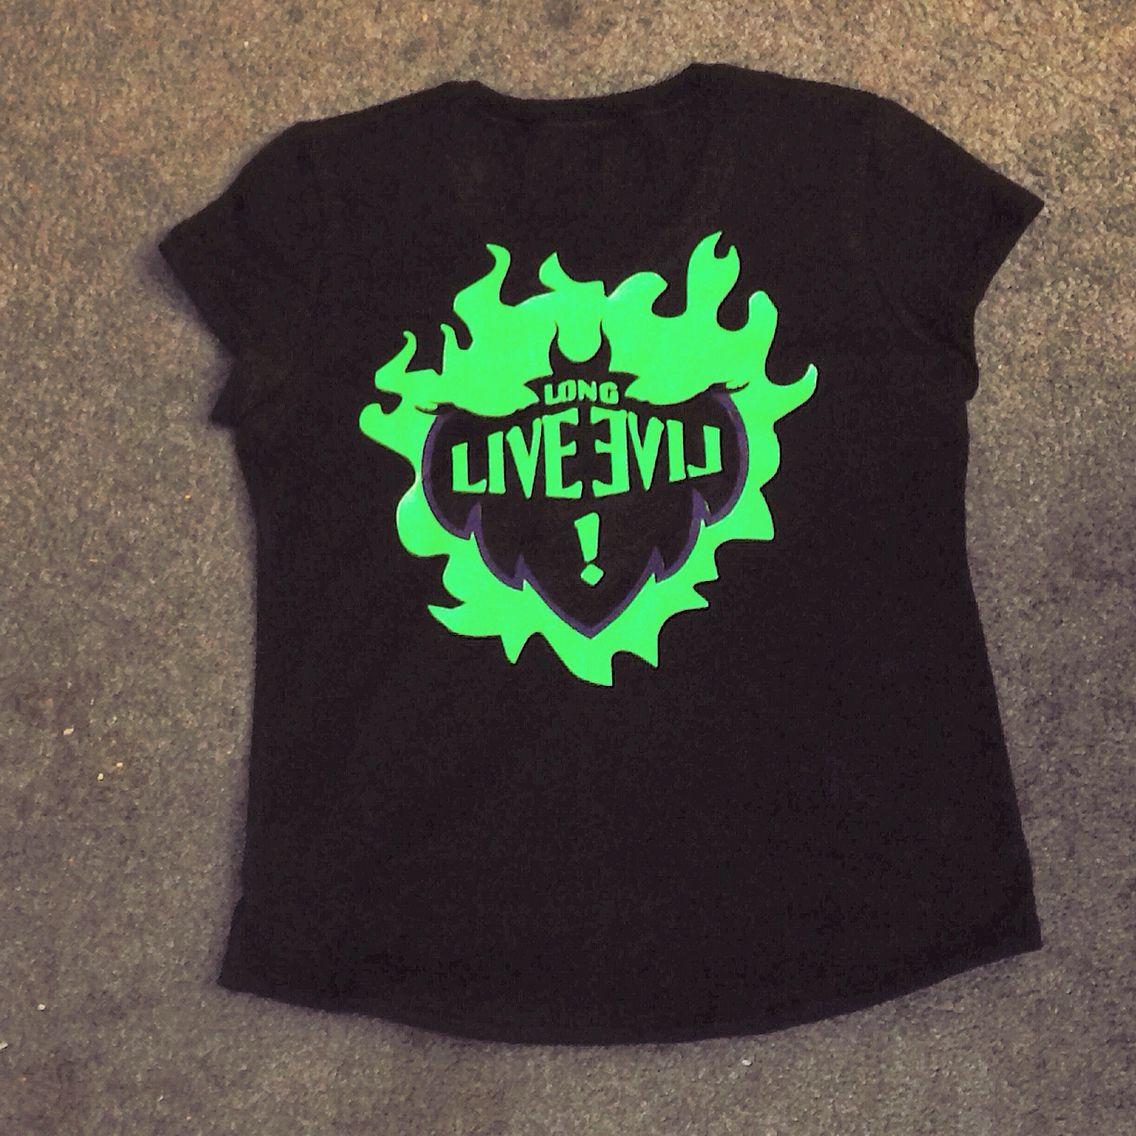 Long Live Evil Descendants Shirt Black Shirt With Fluorescent Green Htv Fire Black And Purple Htv For M Inspirational Shirt Shirt Designs Tshirt Designs